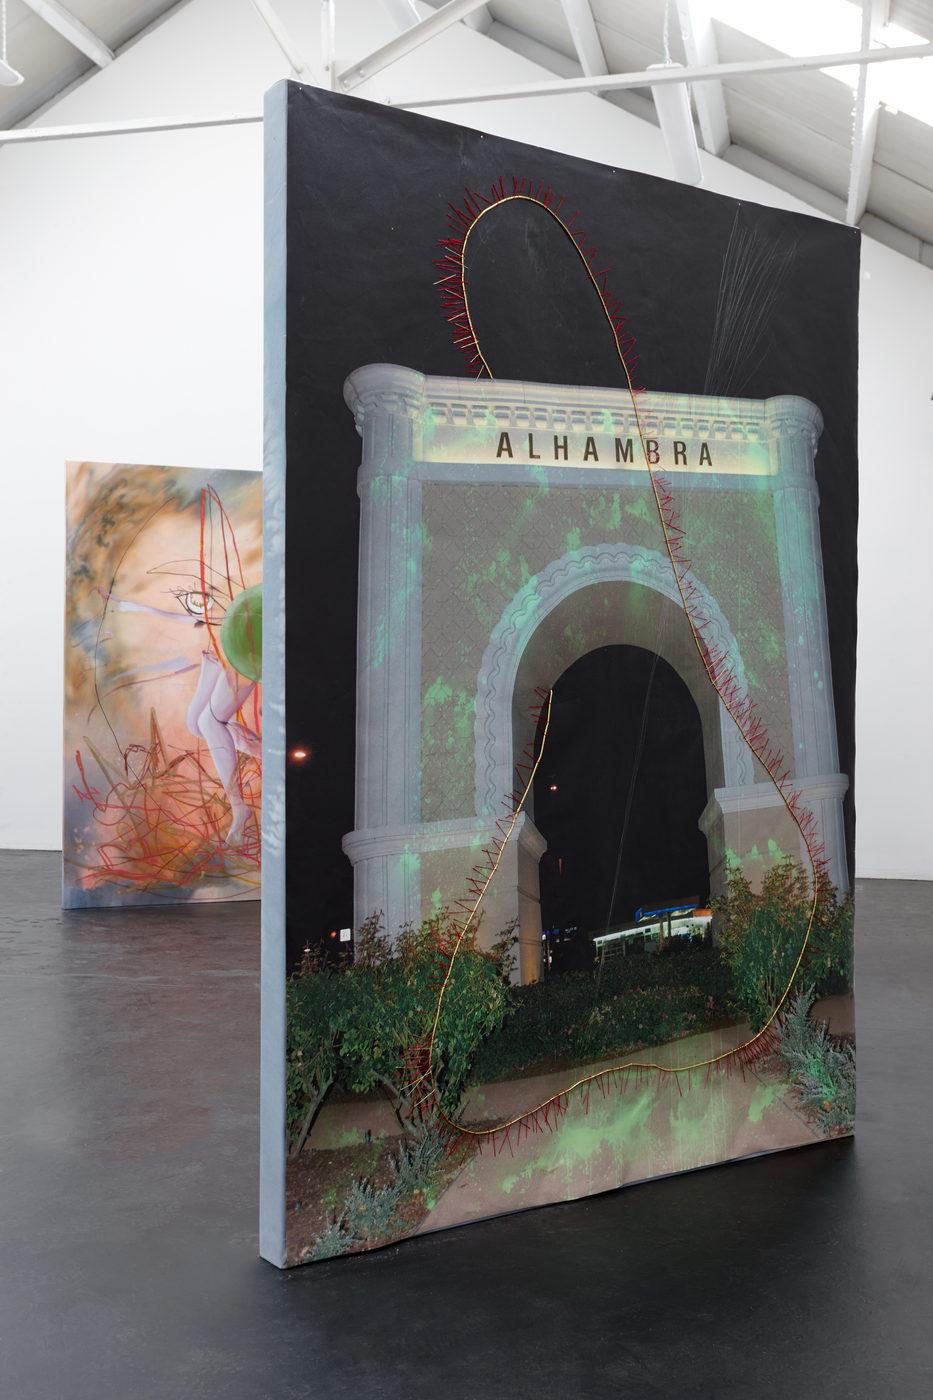 06. Nora Berman - Caught flower (Alhambra arch), 2016 (ii)